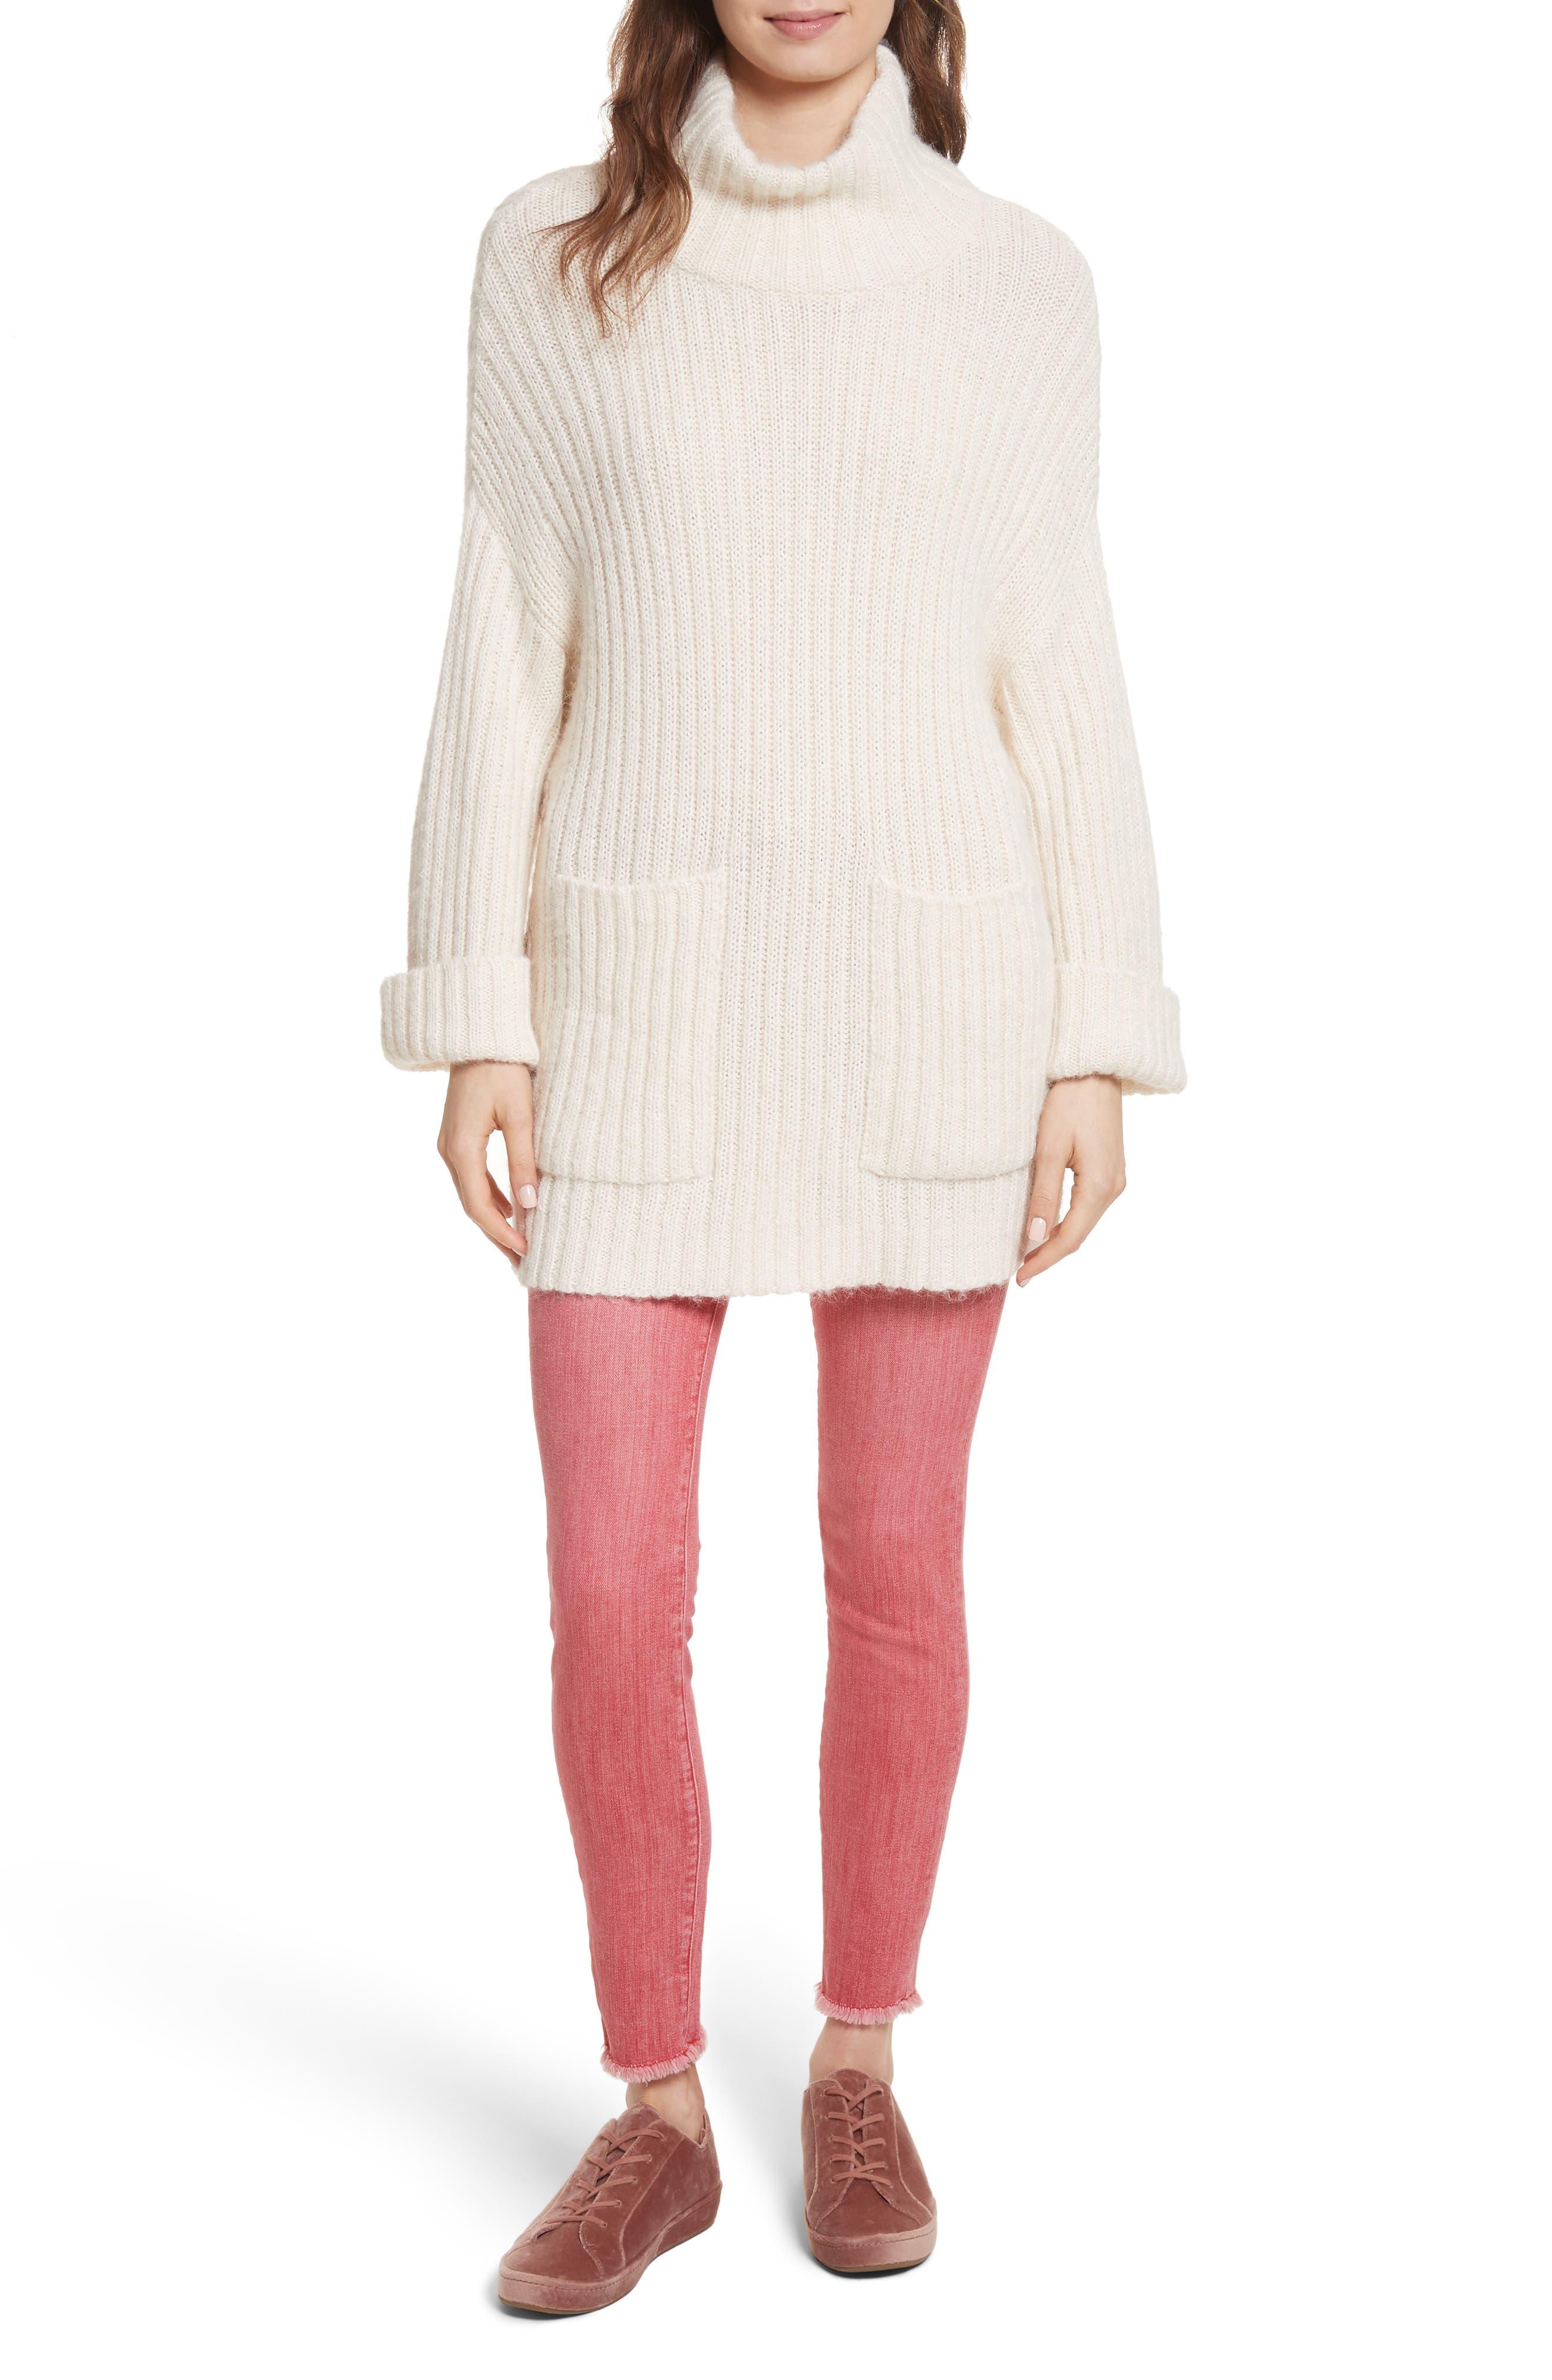 Banain Turtleneck Sweater,                             Alternate thumbnail 7, color,                             114